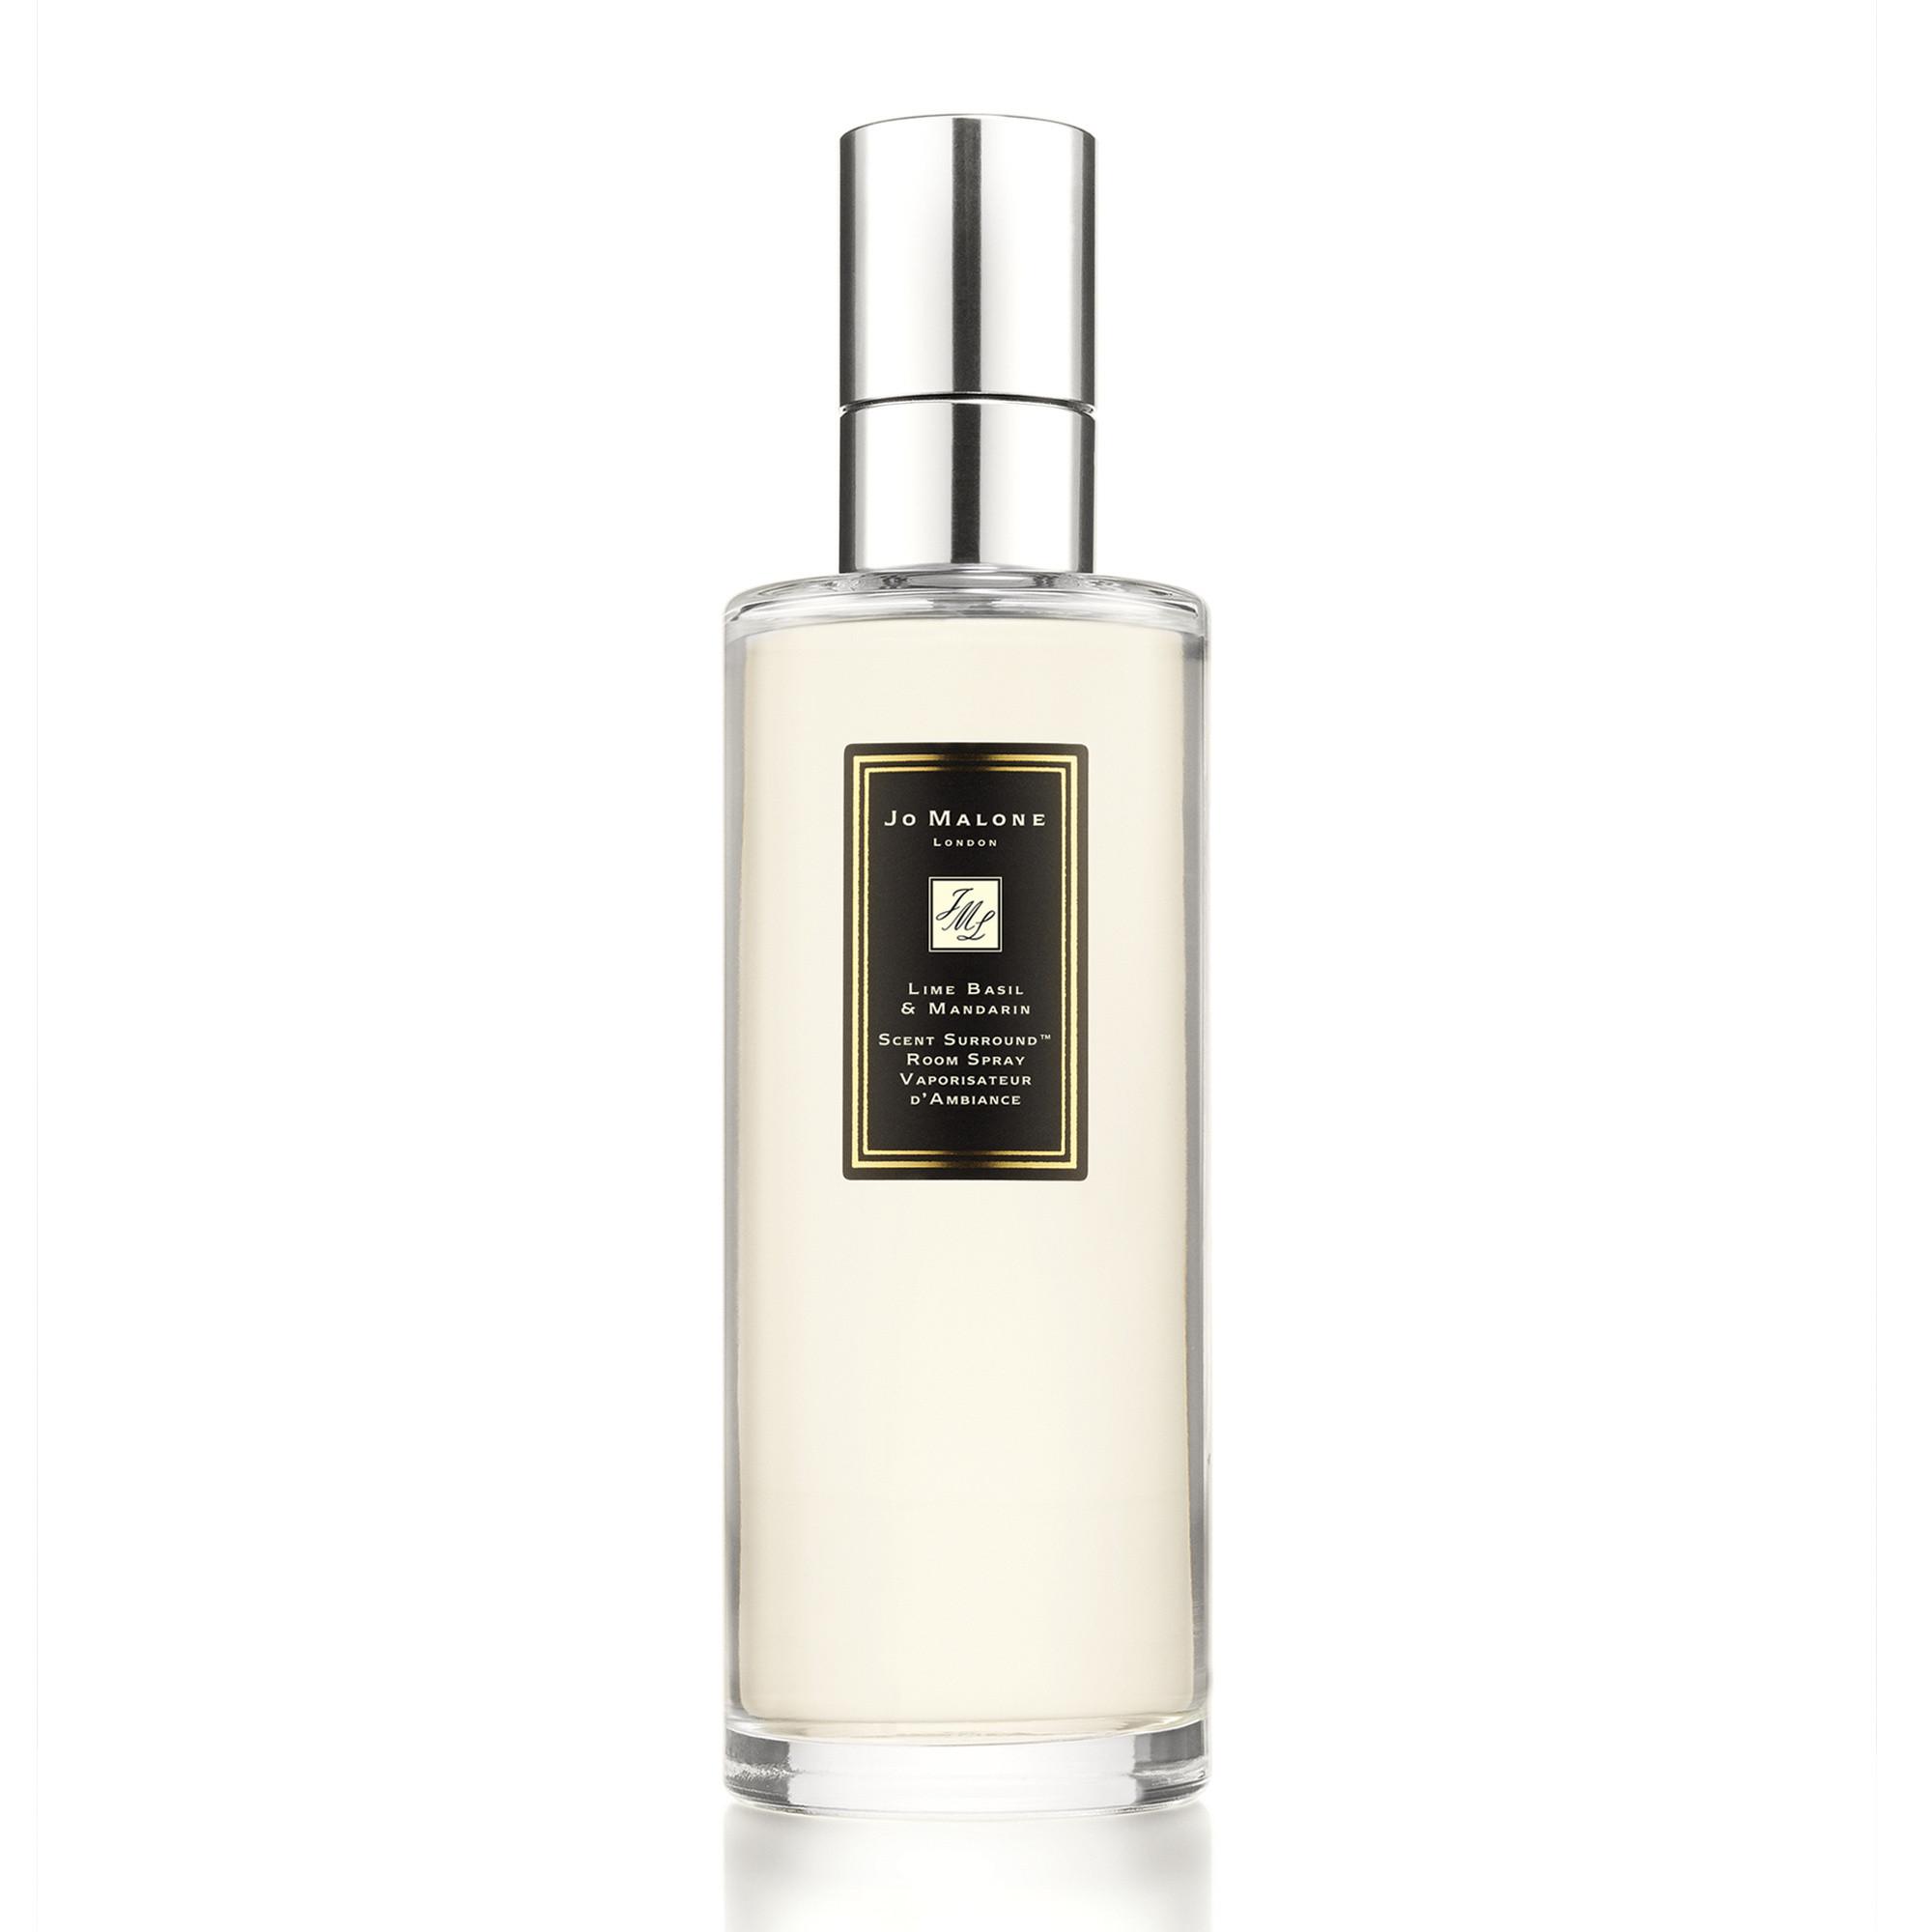 Jo Malone London lime basil & mandarin room spray 175 ml, Nero, large image number 0